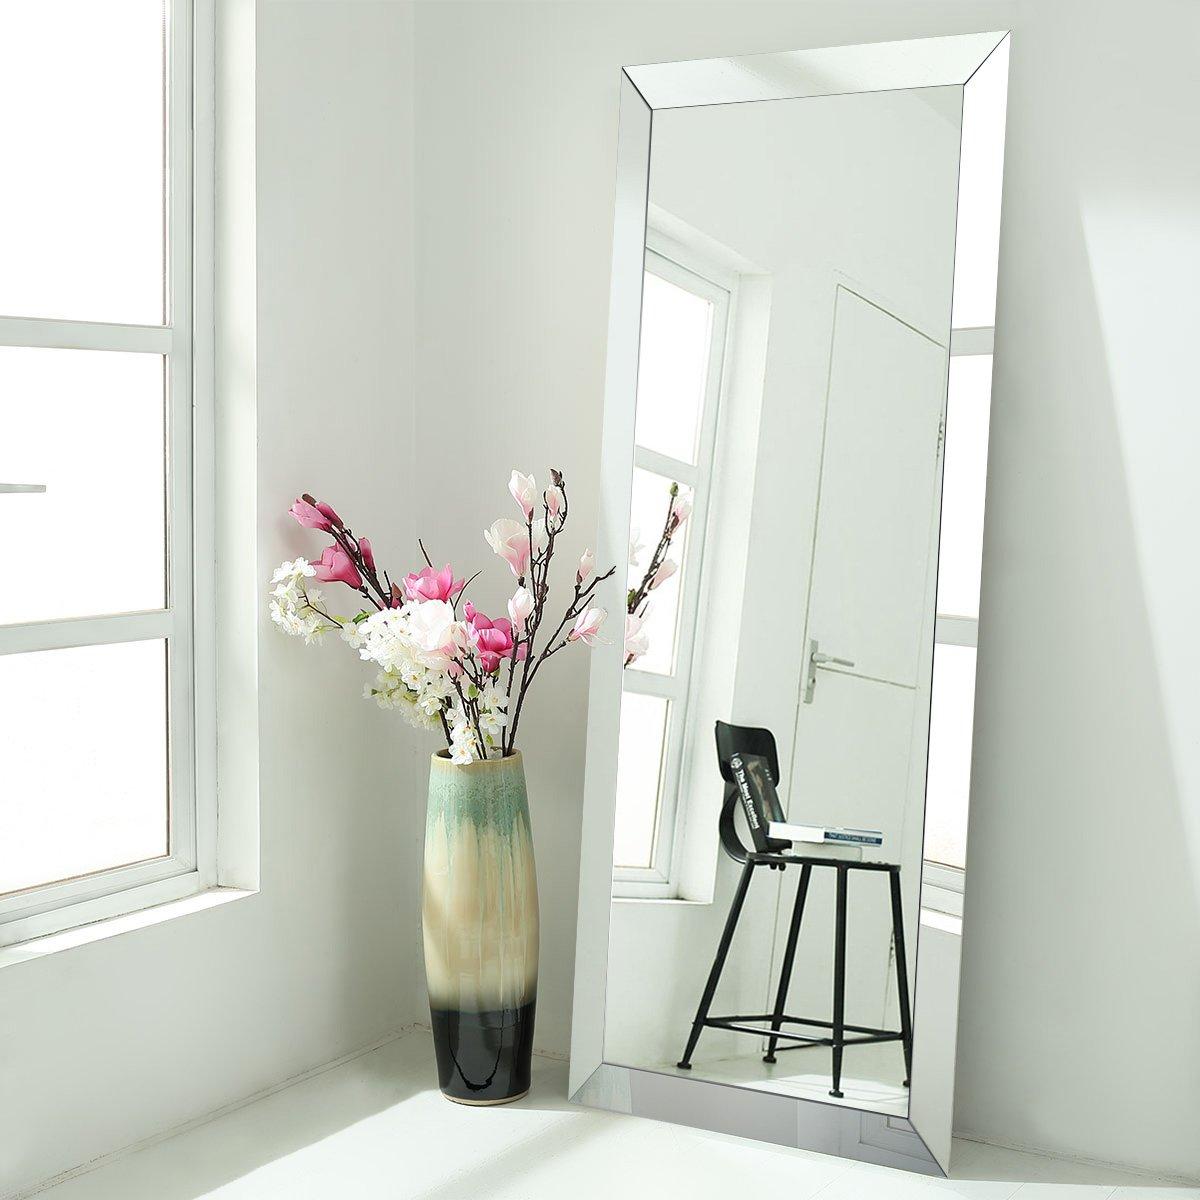 Floor Mirrors Full Length Large Size Mirrored Bevel Framed Mirror for Bedroom Sitting Room Bathroom (30'' x 70'')